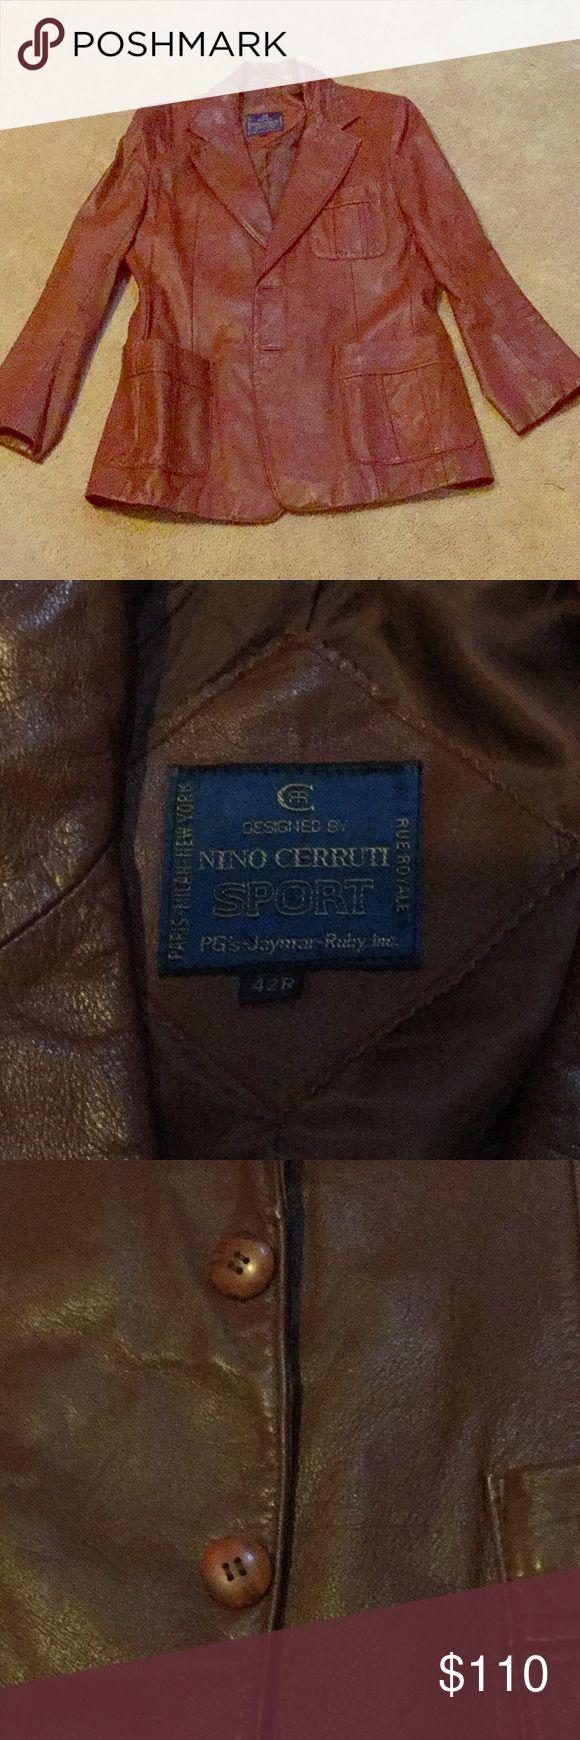 Men's Vintage Leather Coat Vintage leather coat. Nino Cerruti Jackets & Coats